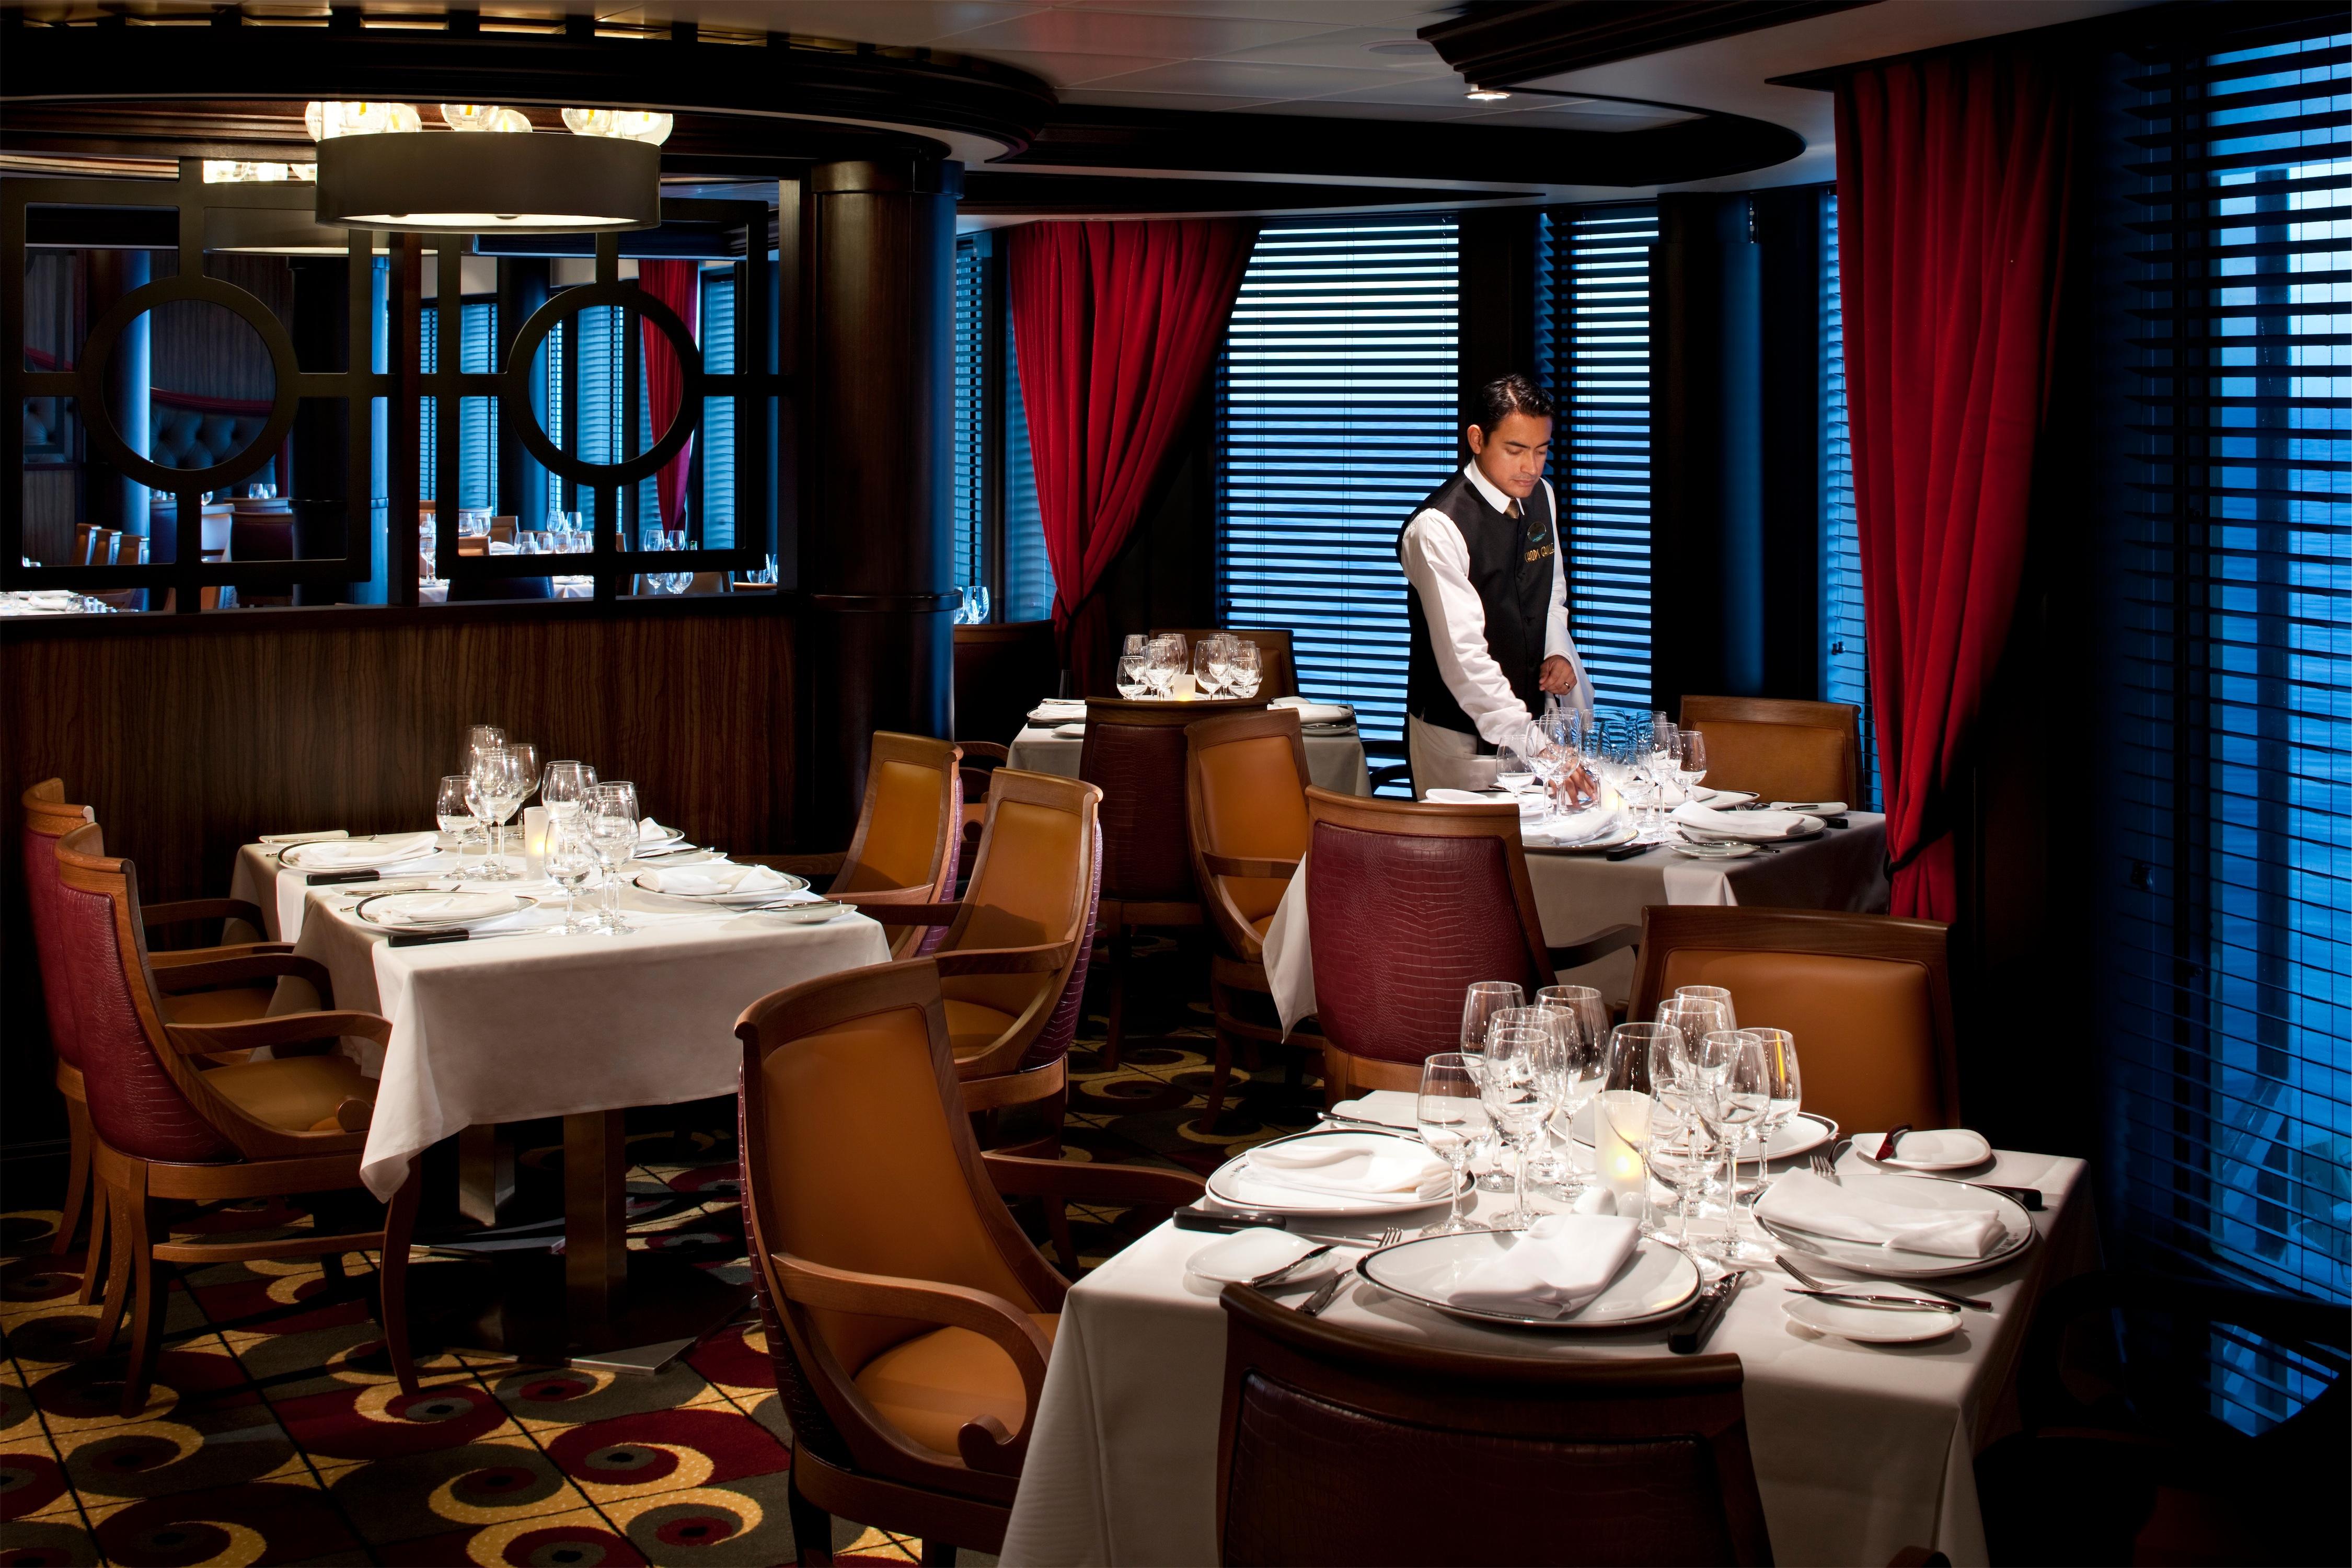 Royal Caribbean International Rhapsody of the Seas Interior Chops Grille.jpg